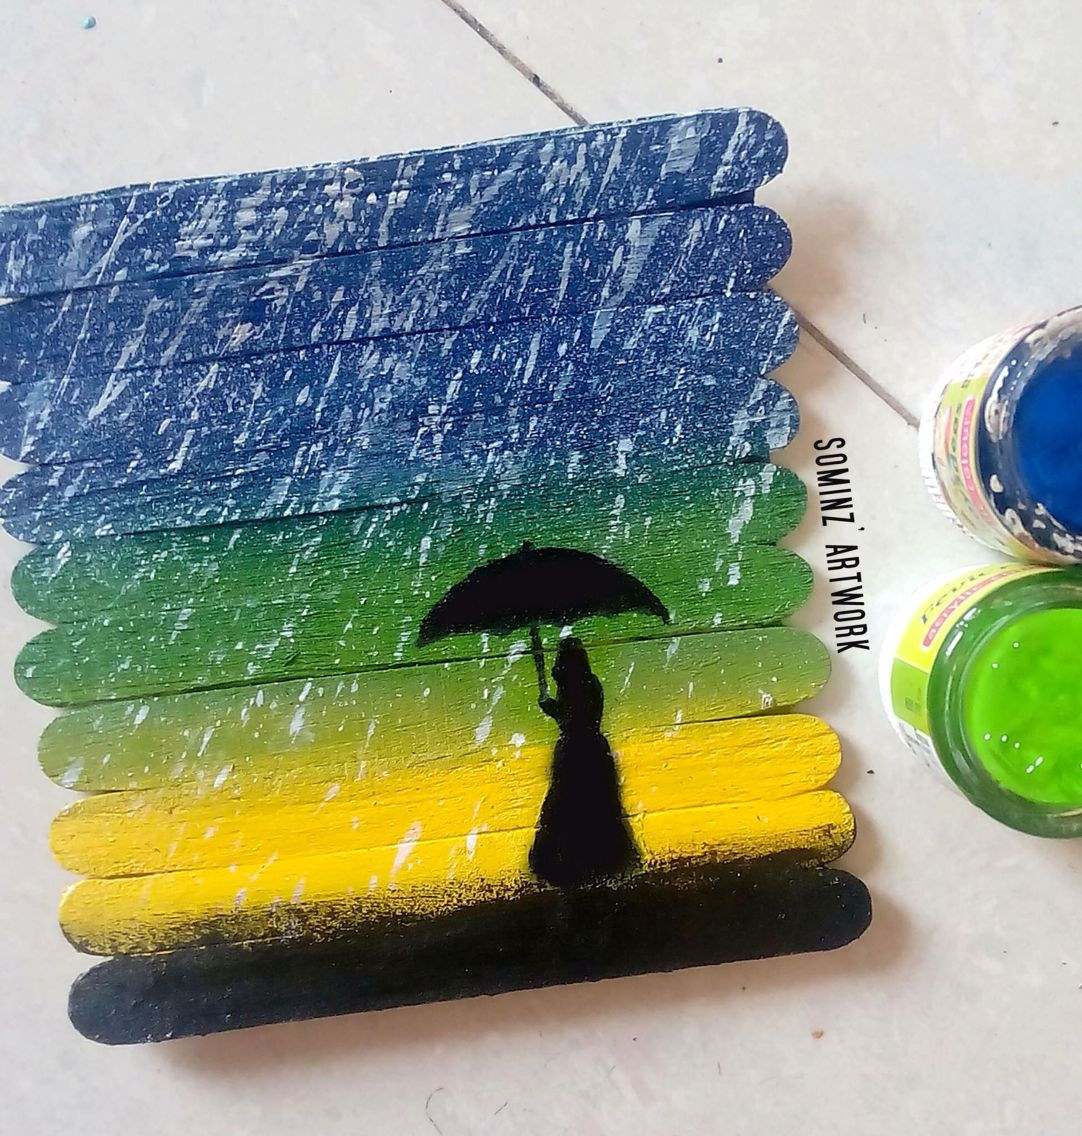 Painting On Ice Cream Sticks Buzlu Dondurma Cubuk Palet Sanati